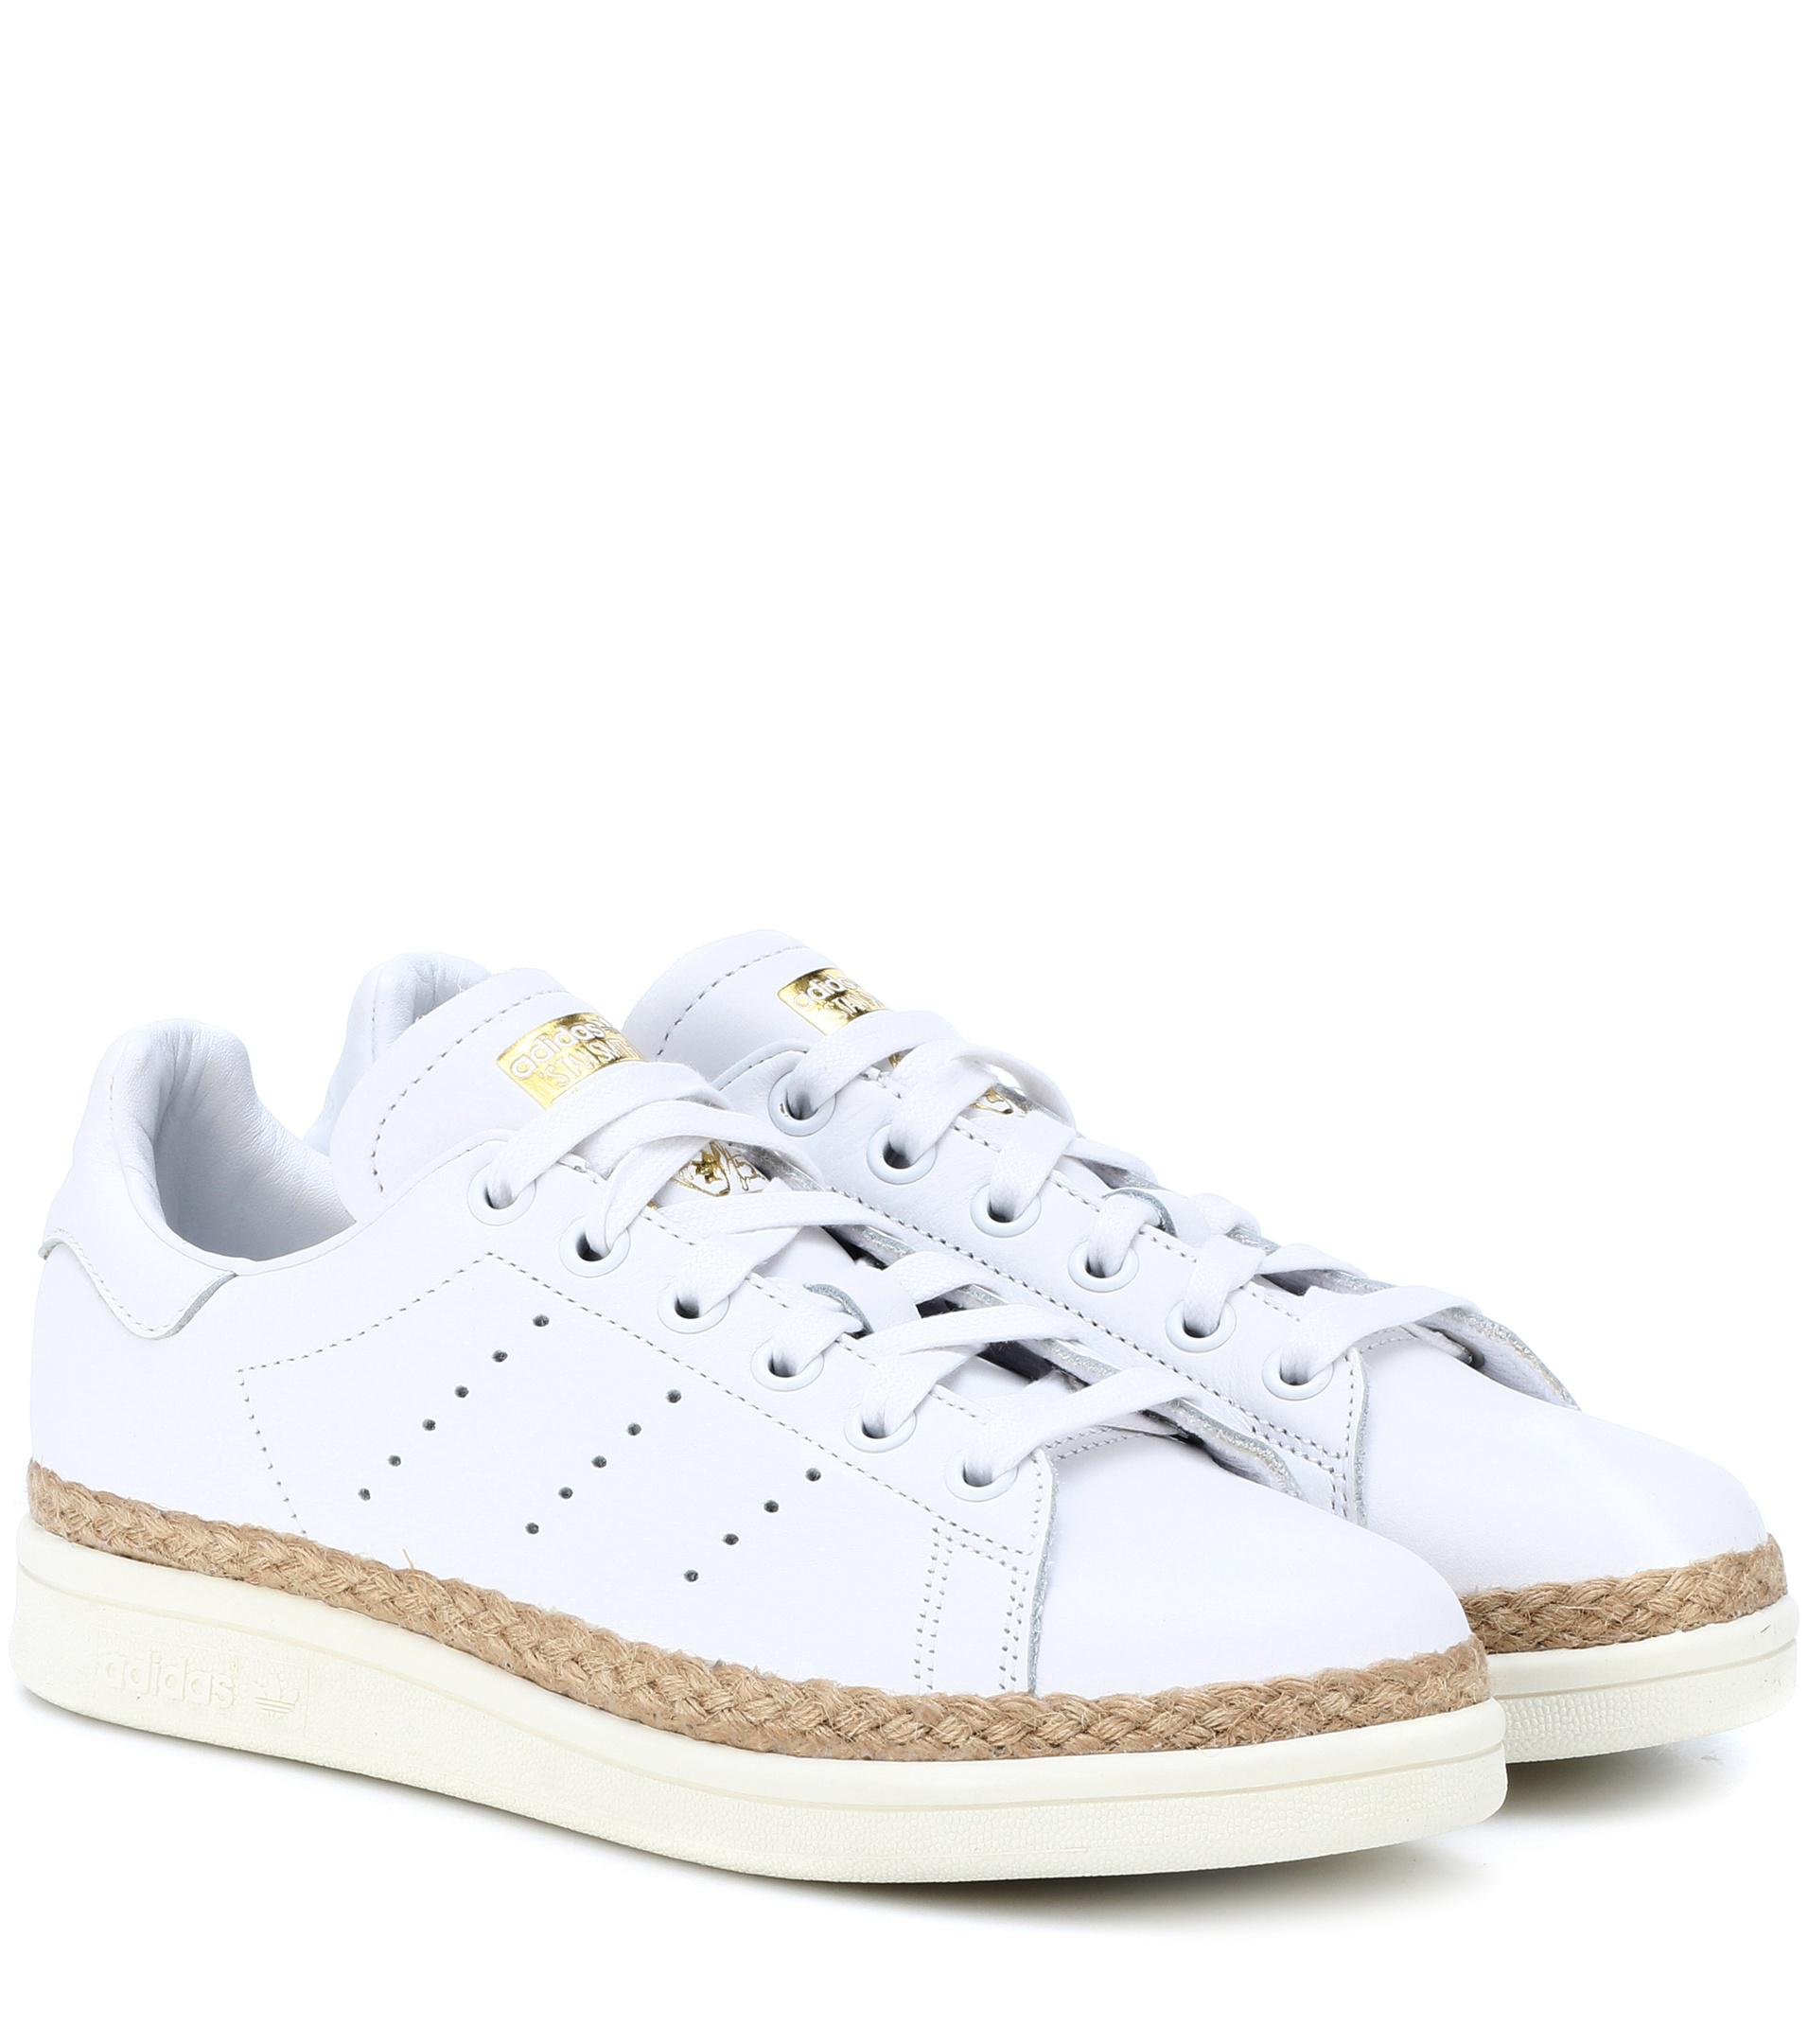 adidas originali stan smith nuovi audaci scarpe bianche lyst